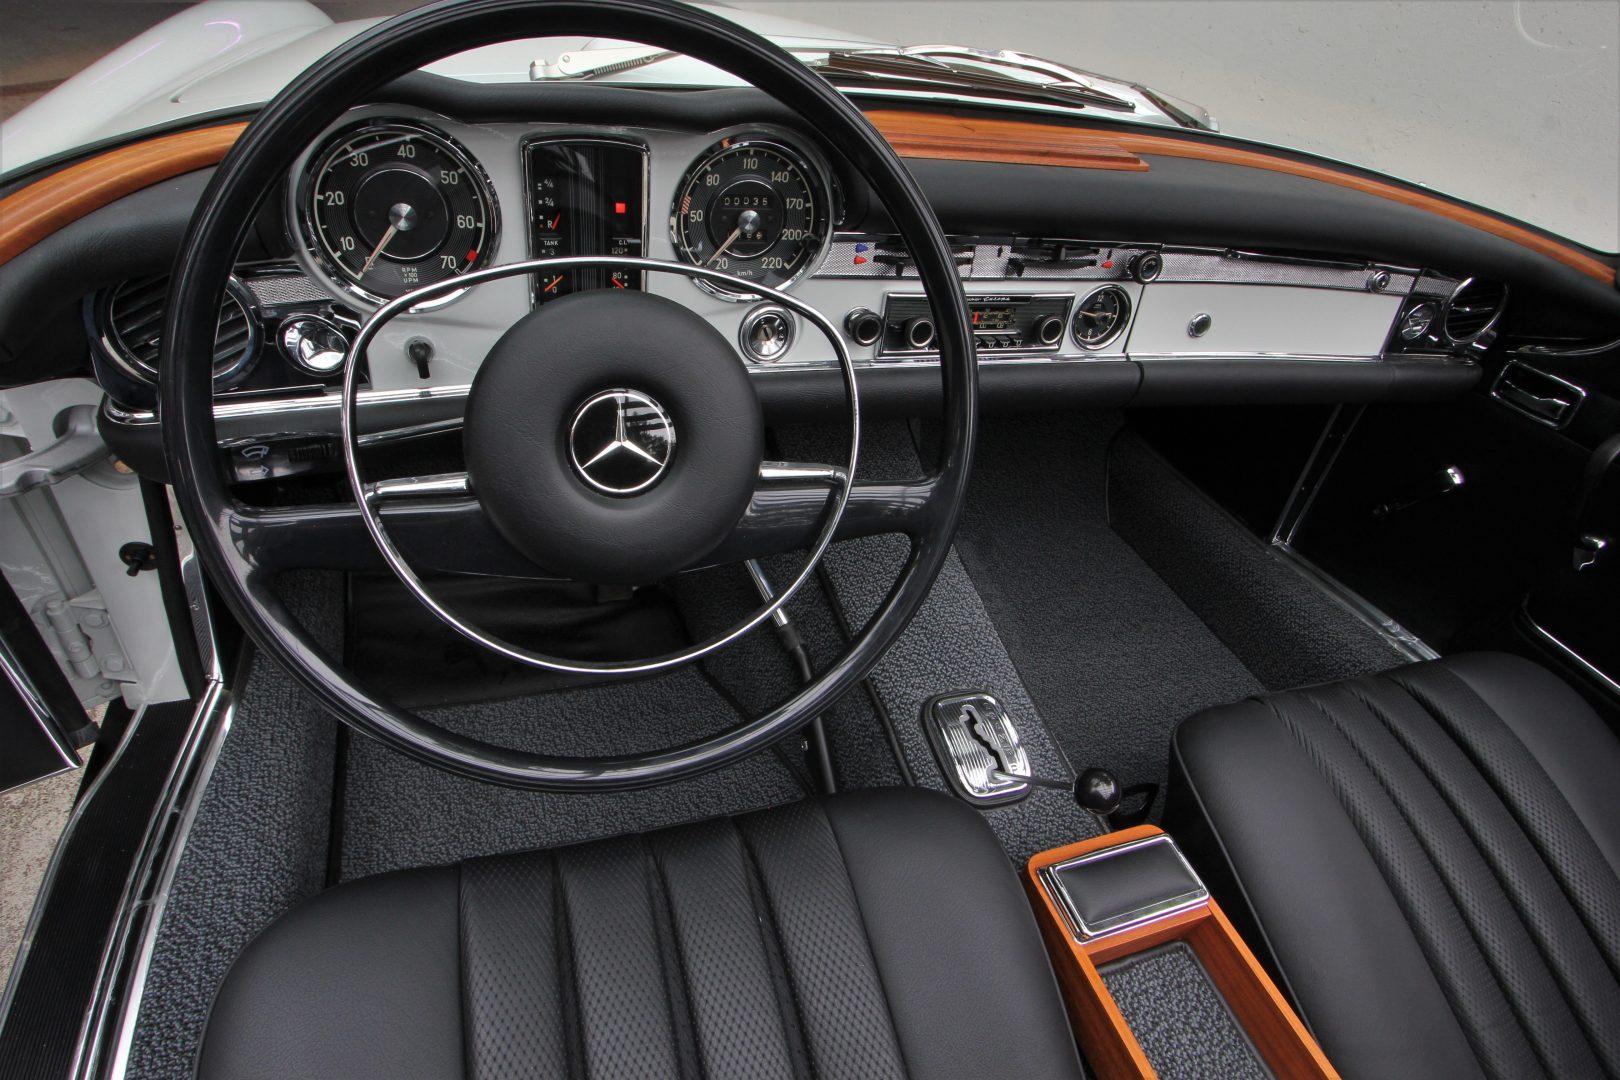 AIL Mercedes-Benz 280 SL Pagode Automatik 1